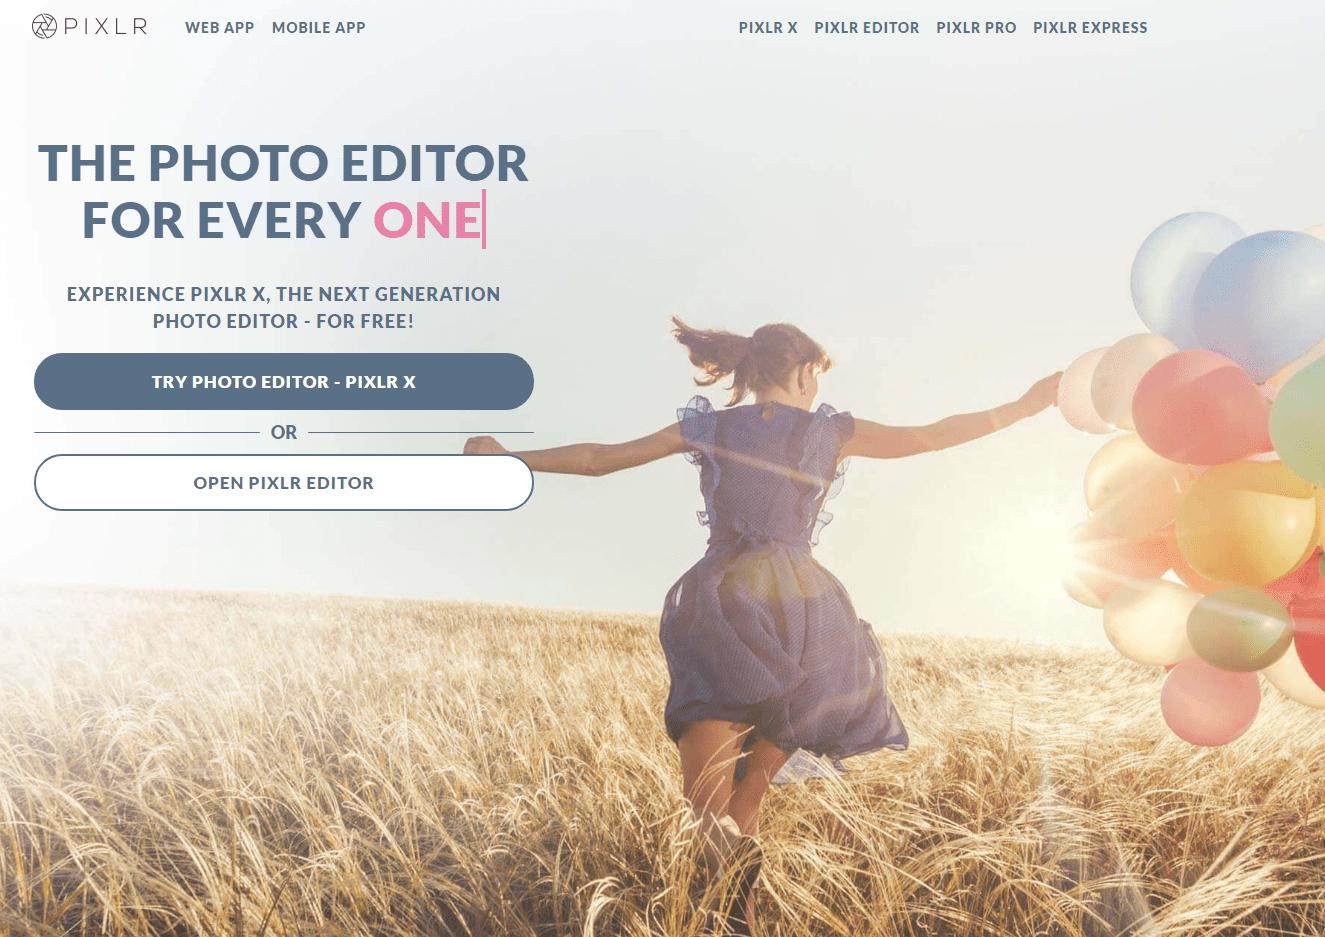 Pixlr photo editing software